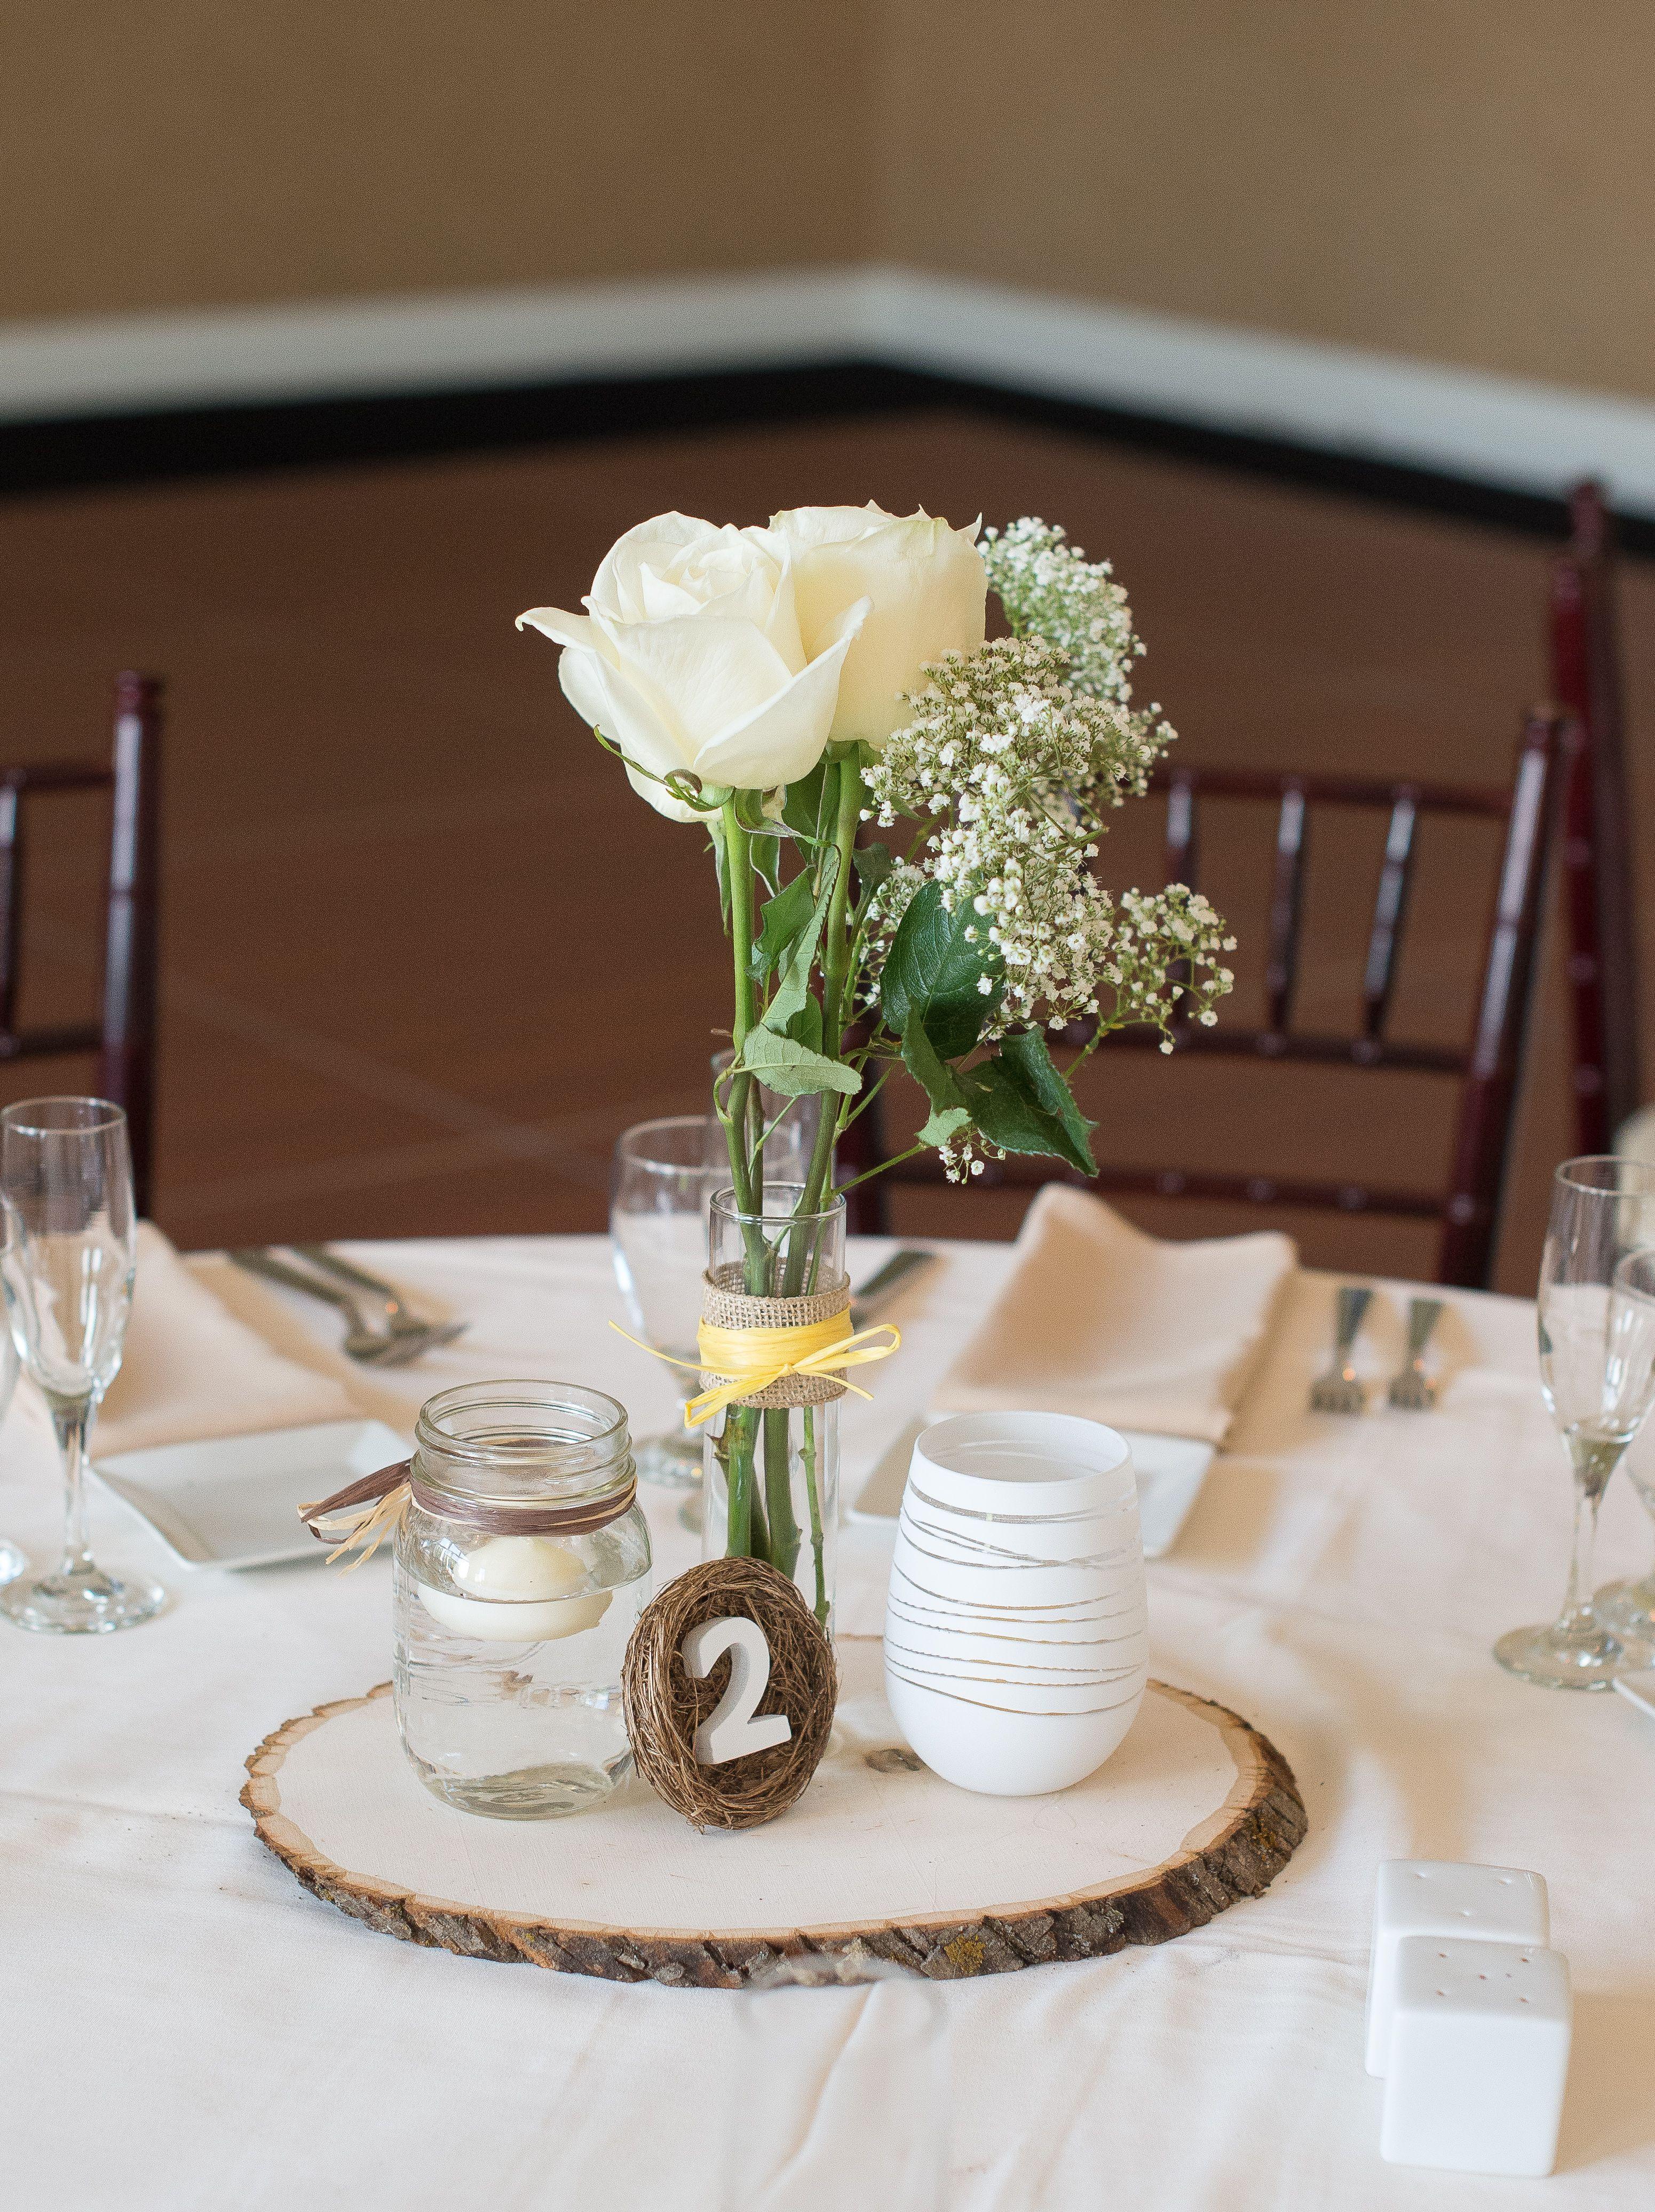 floating candle vases uk of yellow and gray wedding wedding centerpiece wood platform mason within wood platform mason jar for floating candle tall vase with cream roses and babies breath sh